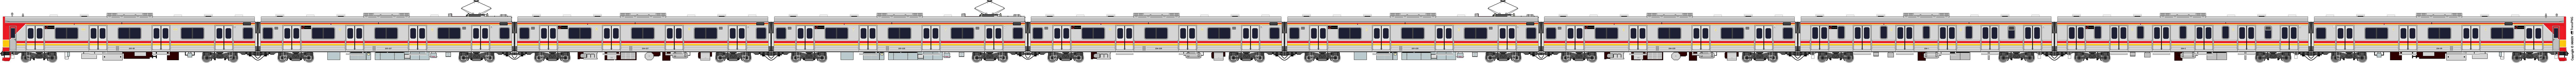 [5405] KAI Commuter Jabodetabek 5405